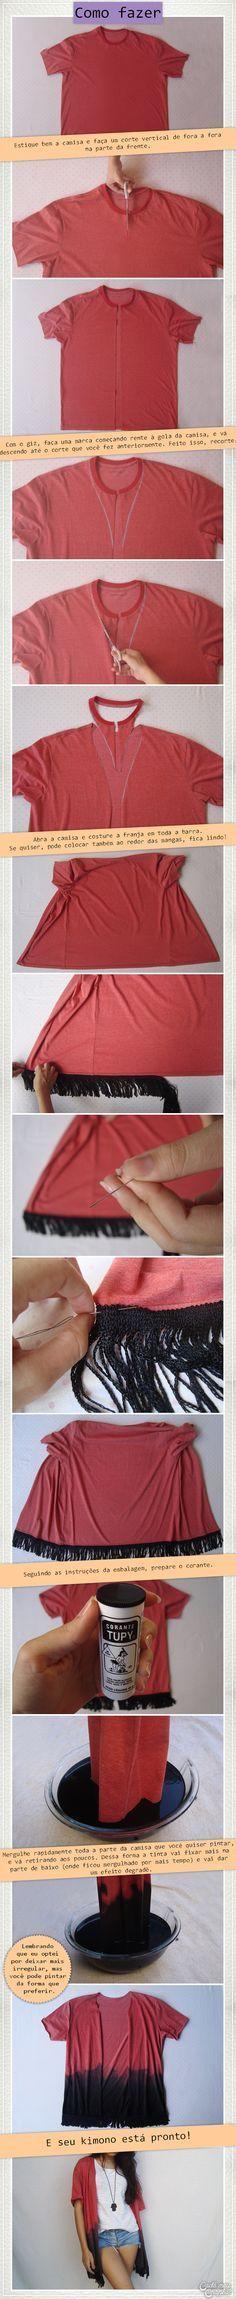 Mens Shirt Skirt Dit